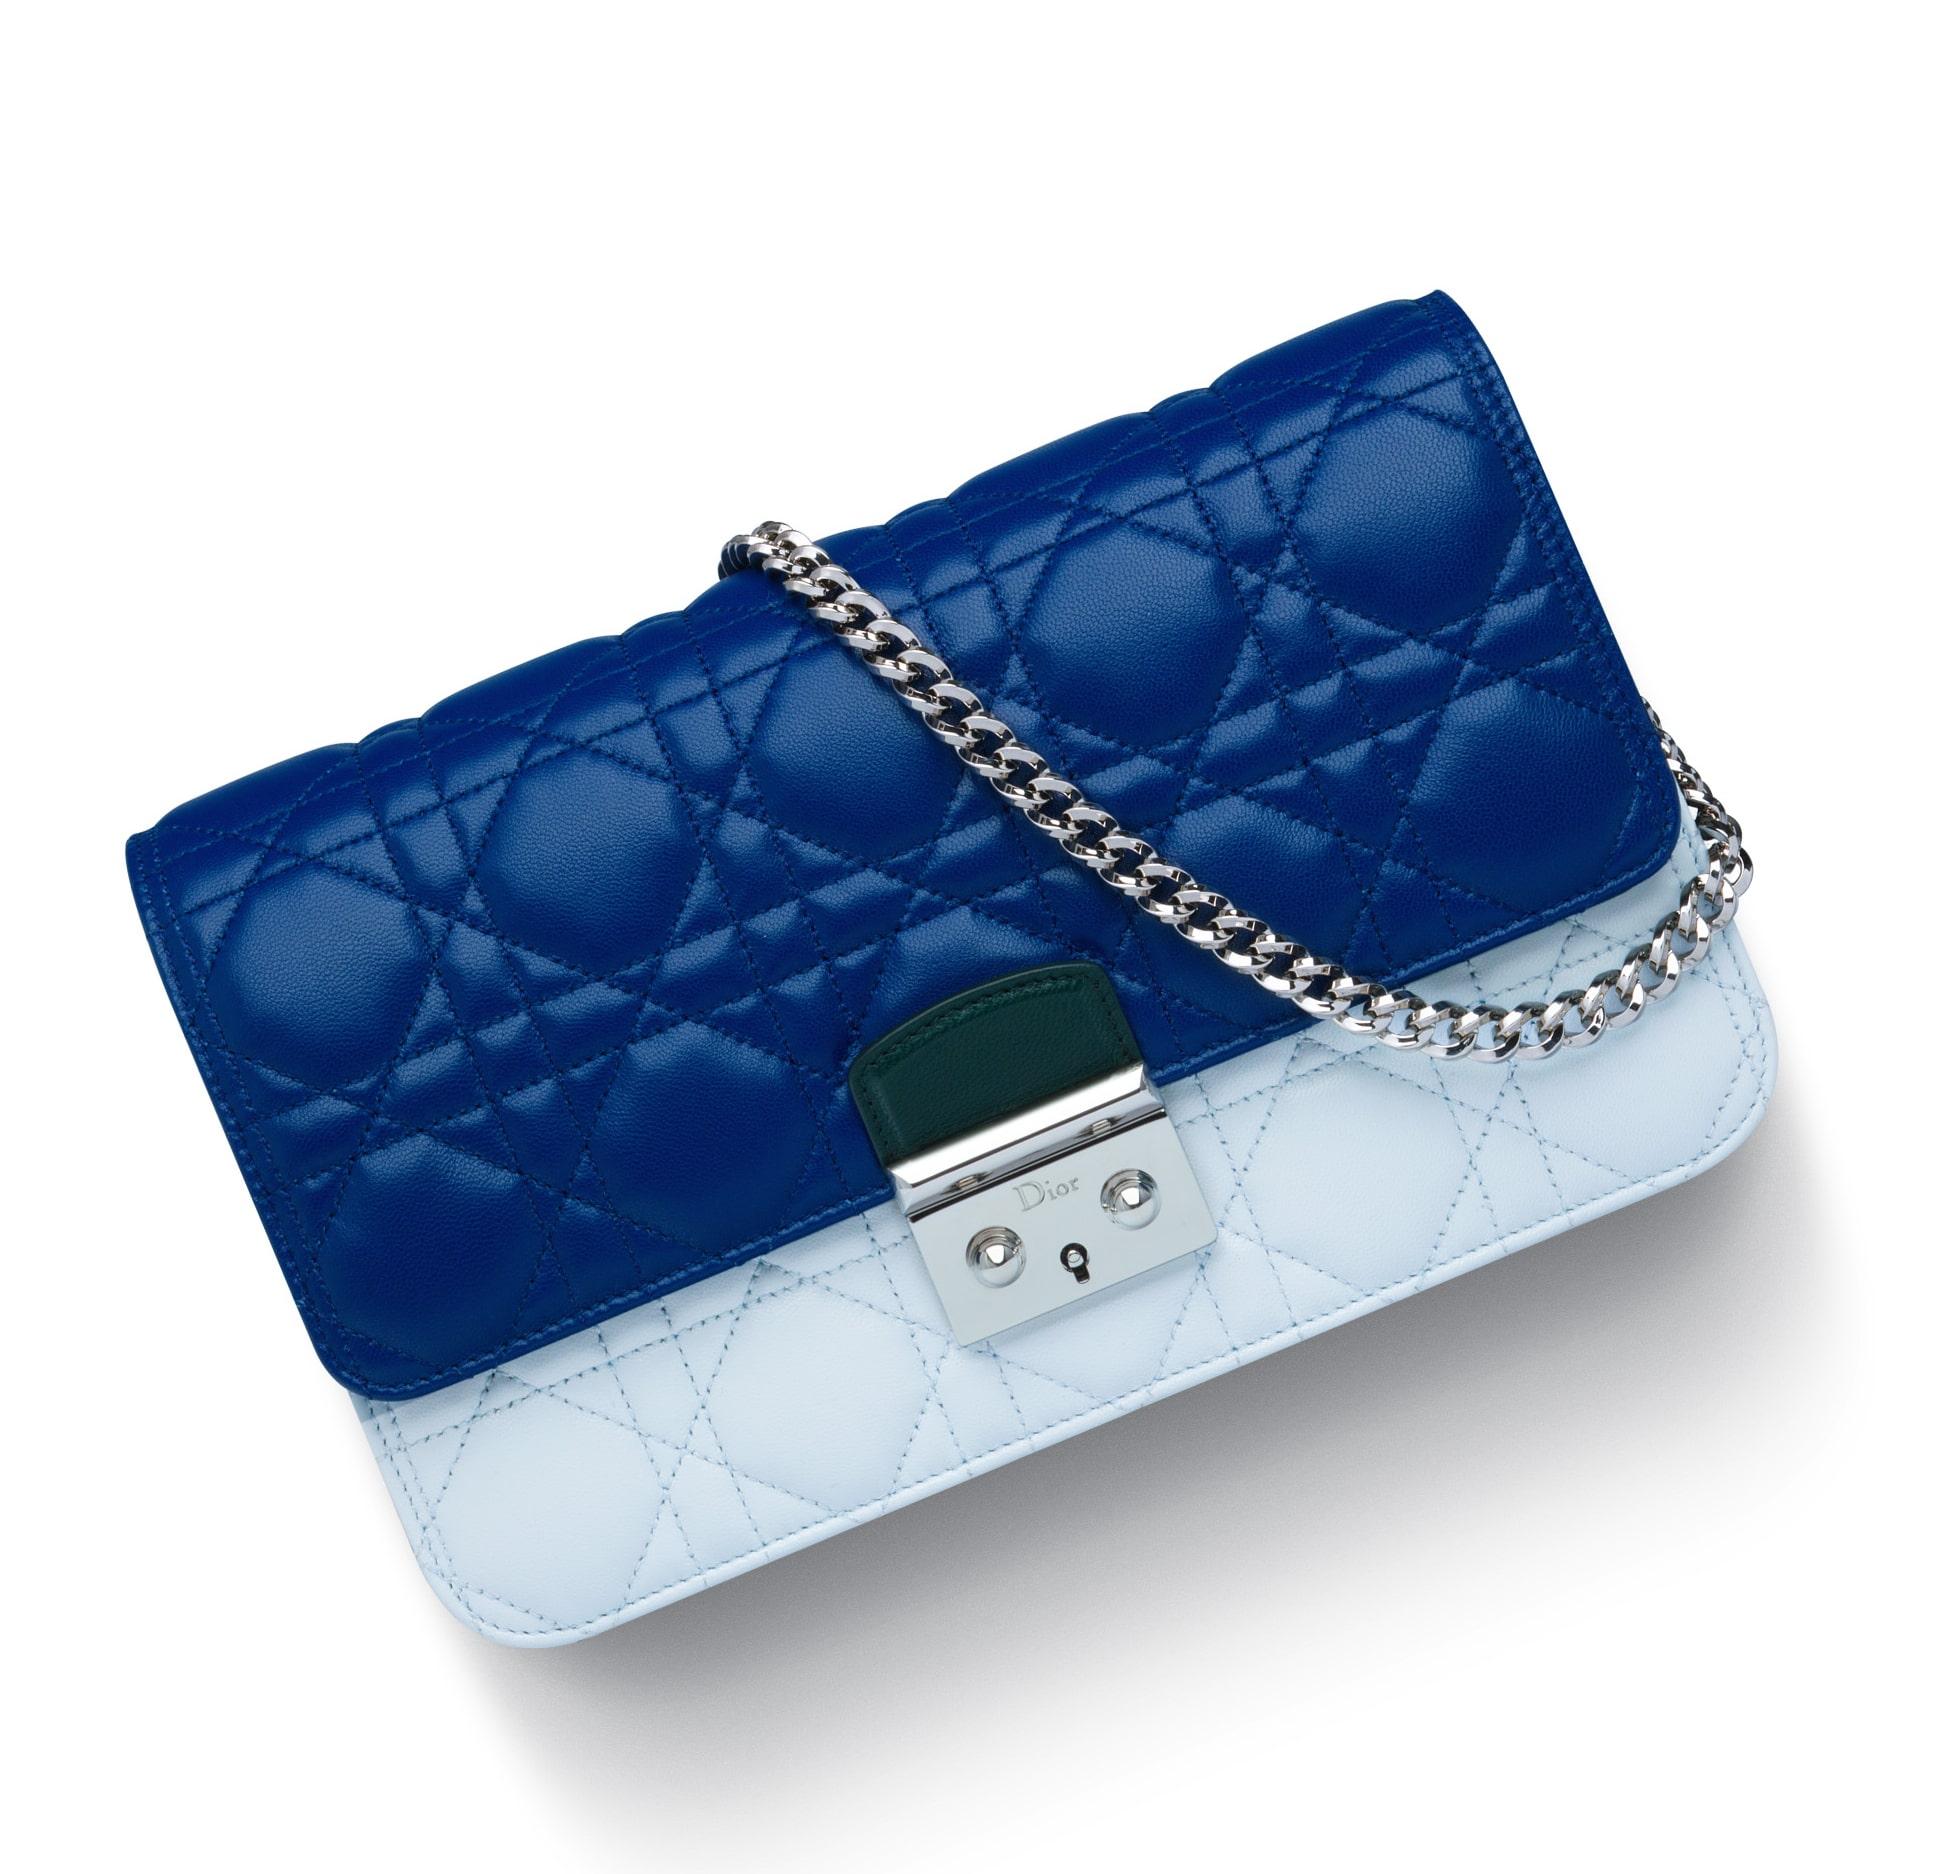 Dior Blue Celeste Deep Green Miss Dior Large Promenade Pouch - Spring 2015 791eb06161